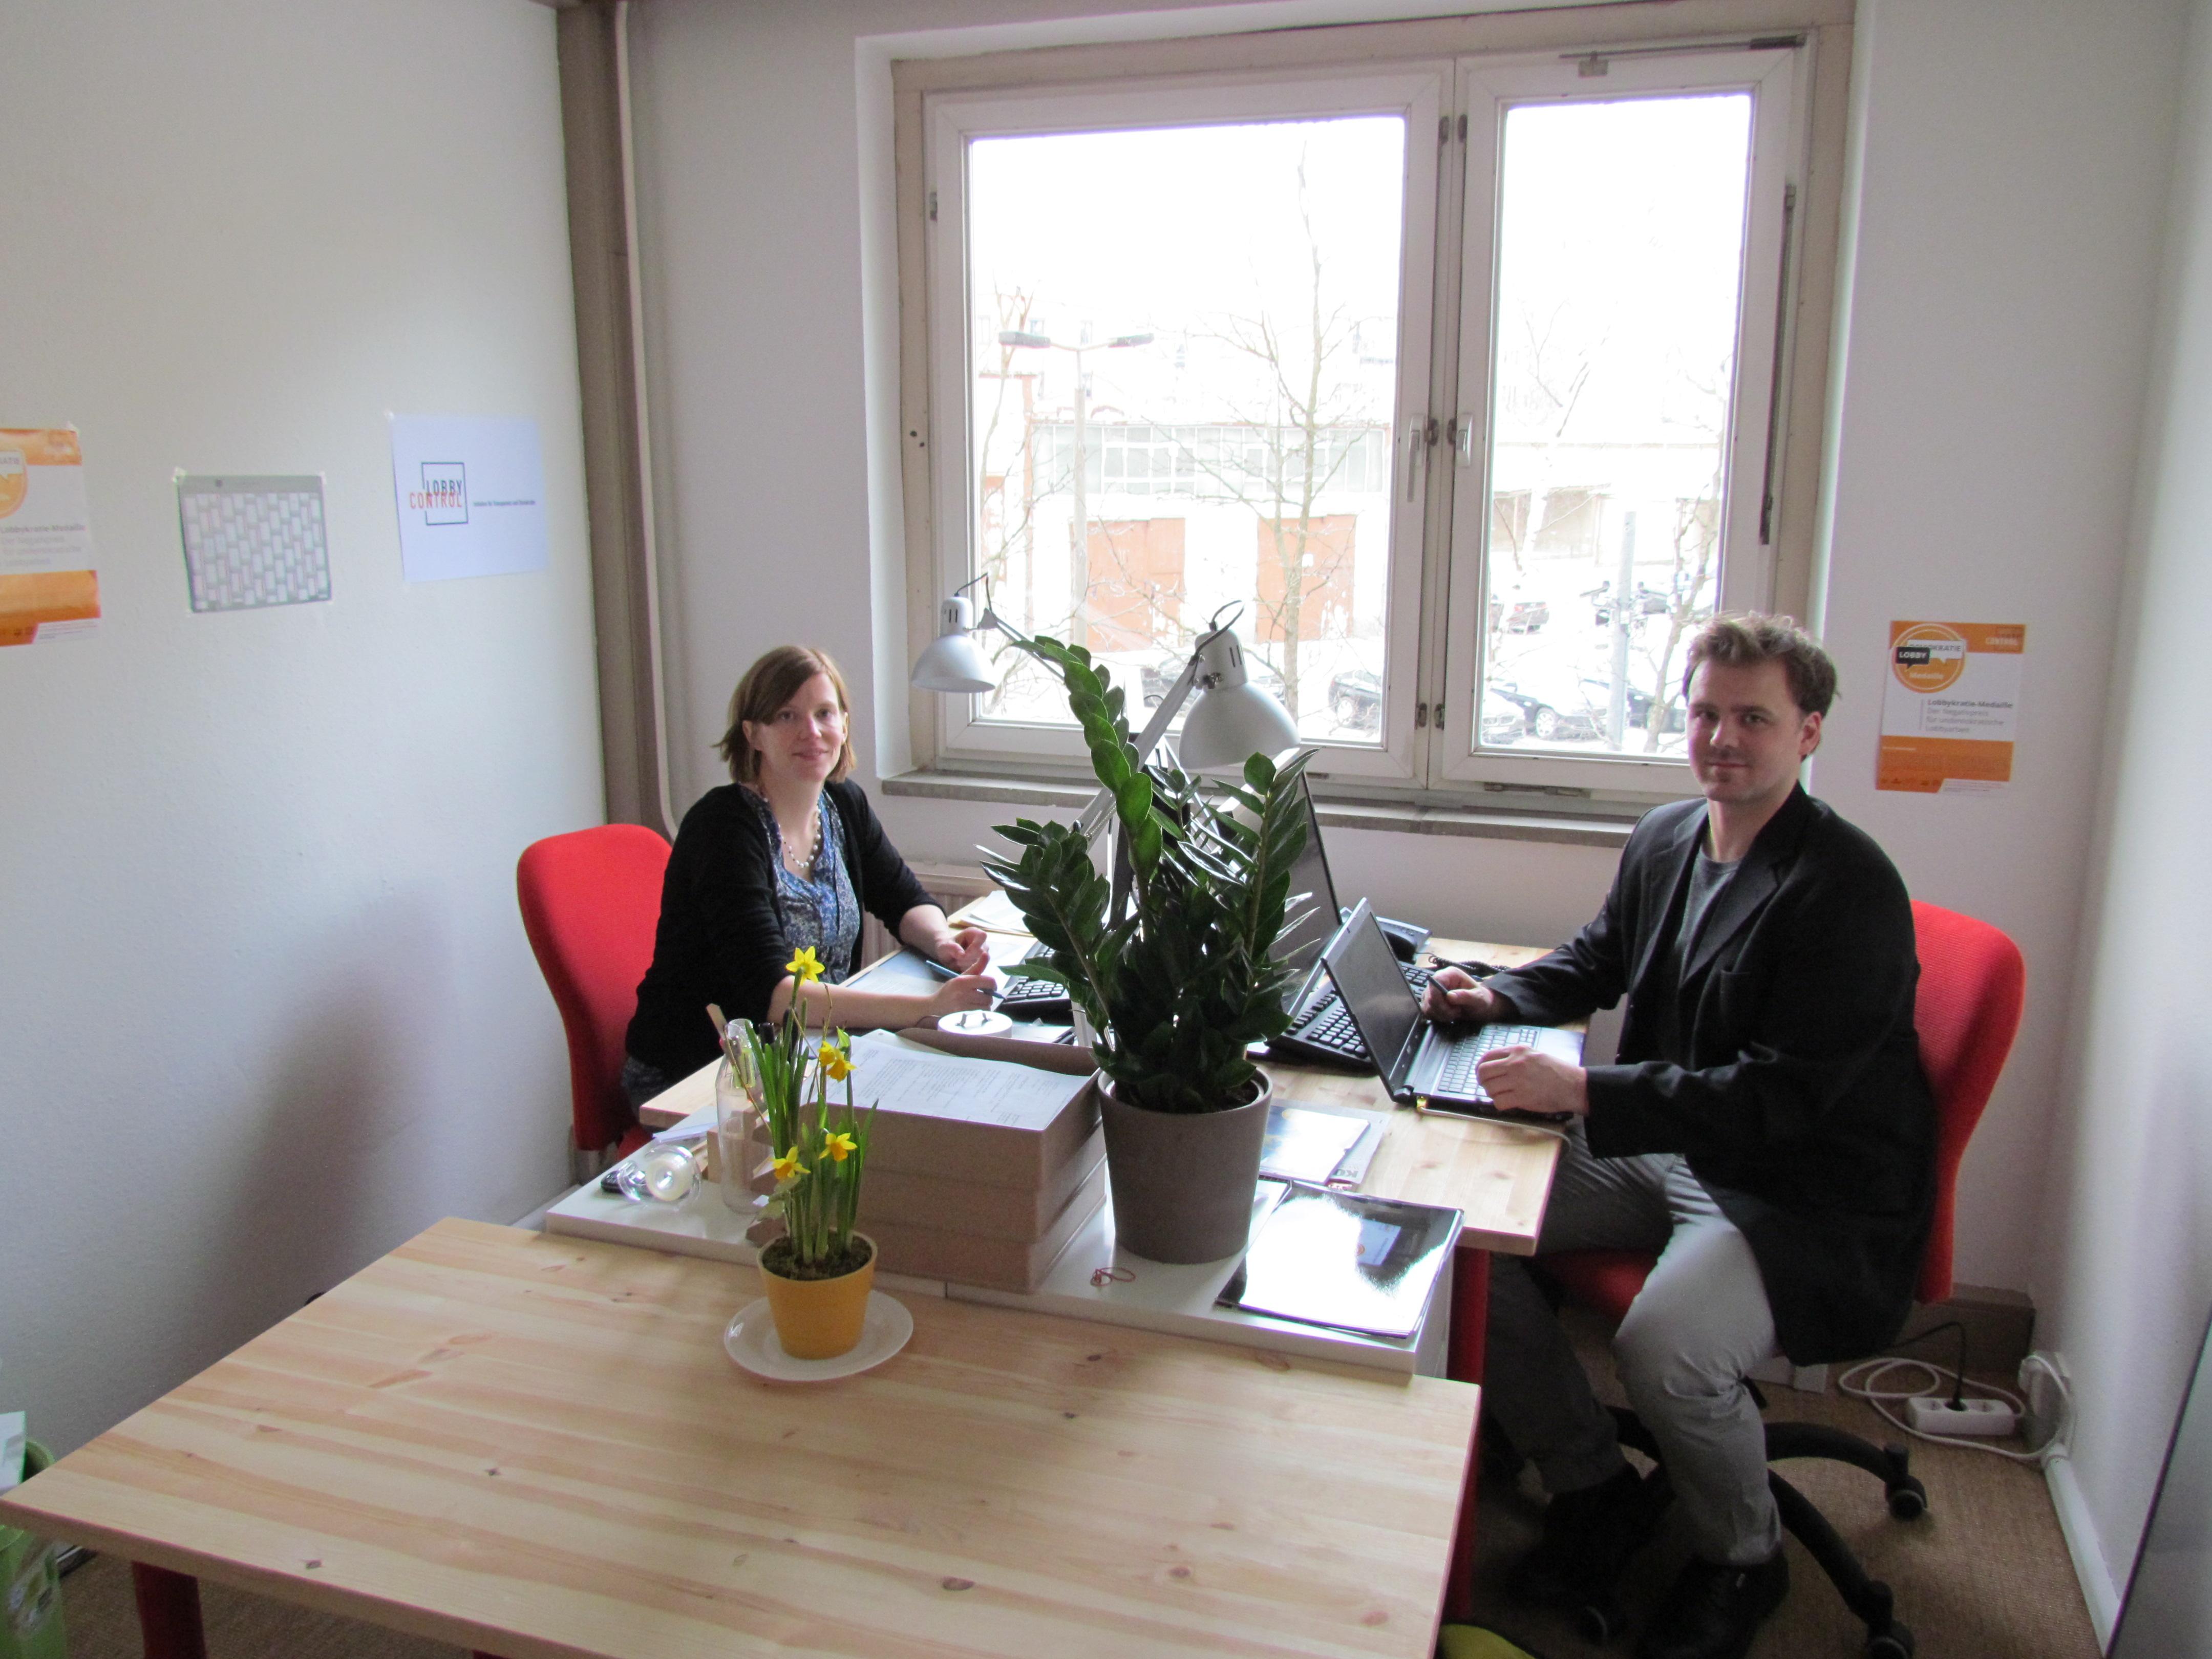 Büro Berlin berliner büro eingeweiht lobbycontrol